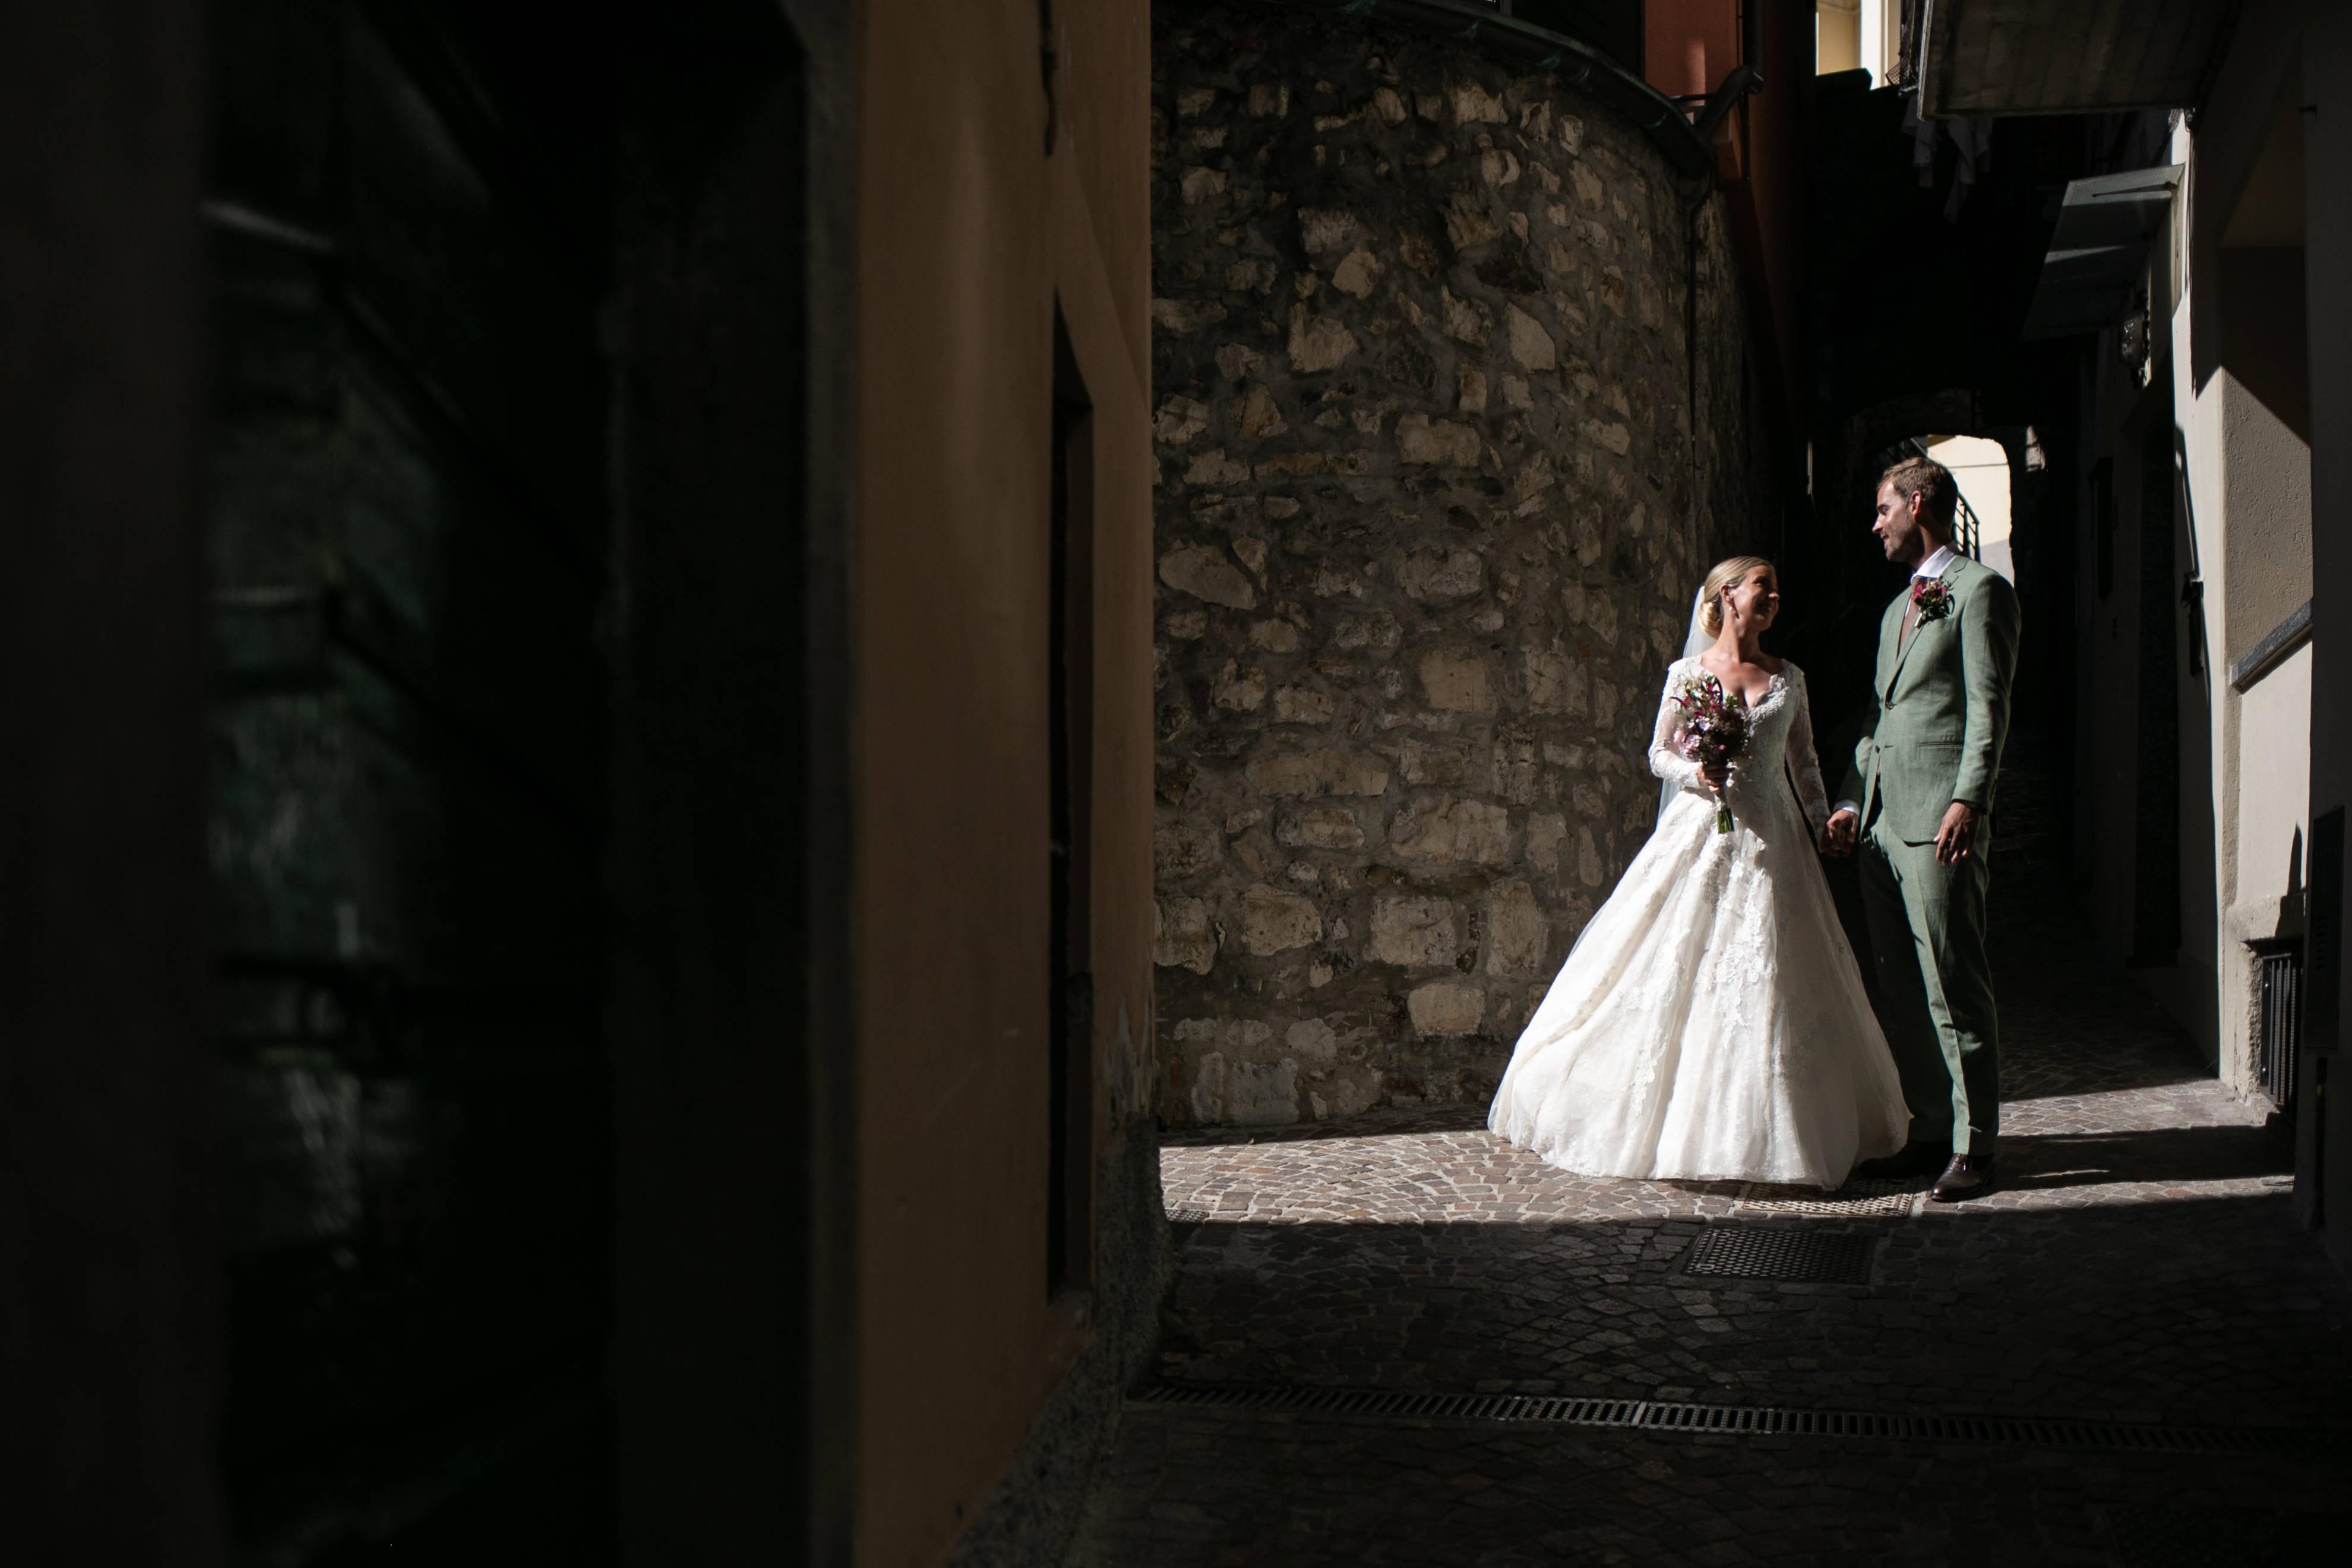 29_gilbertiricca_castellooldofredi_2019